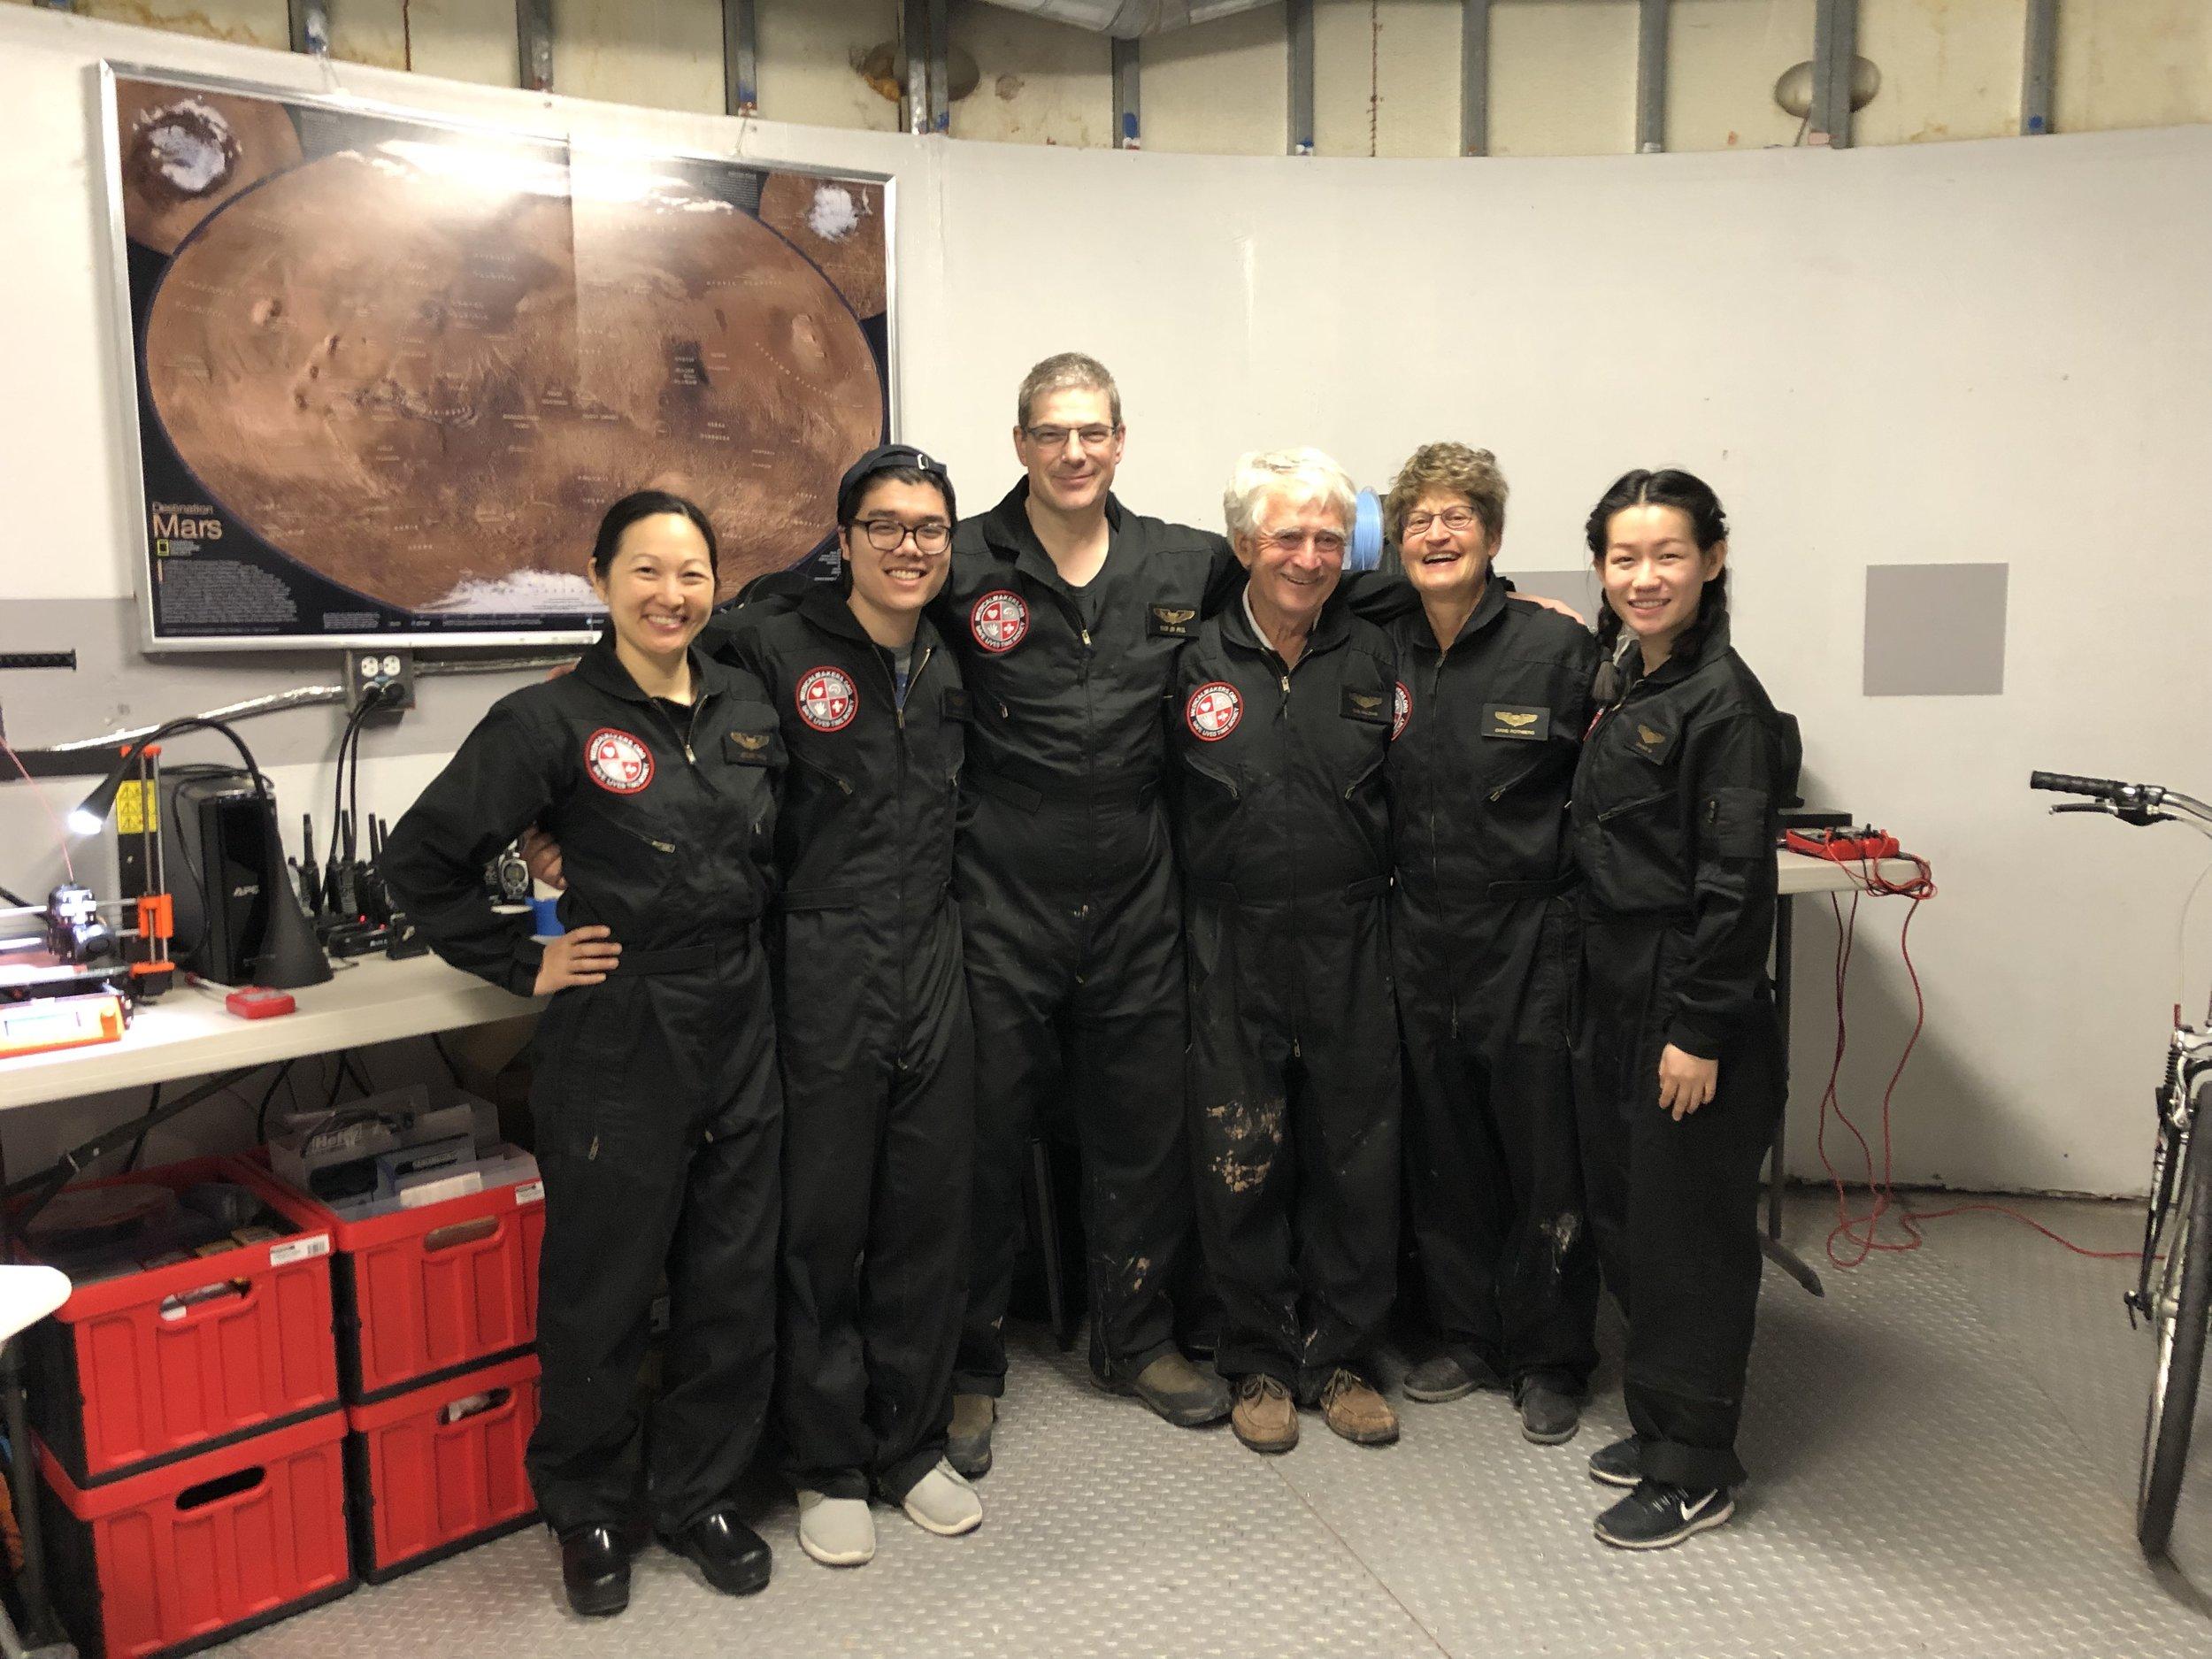 Crew 207 Group Photo.jpg